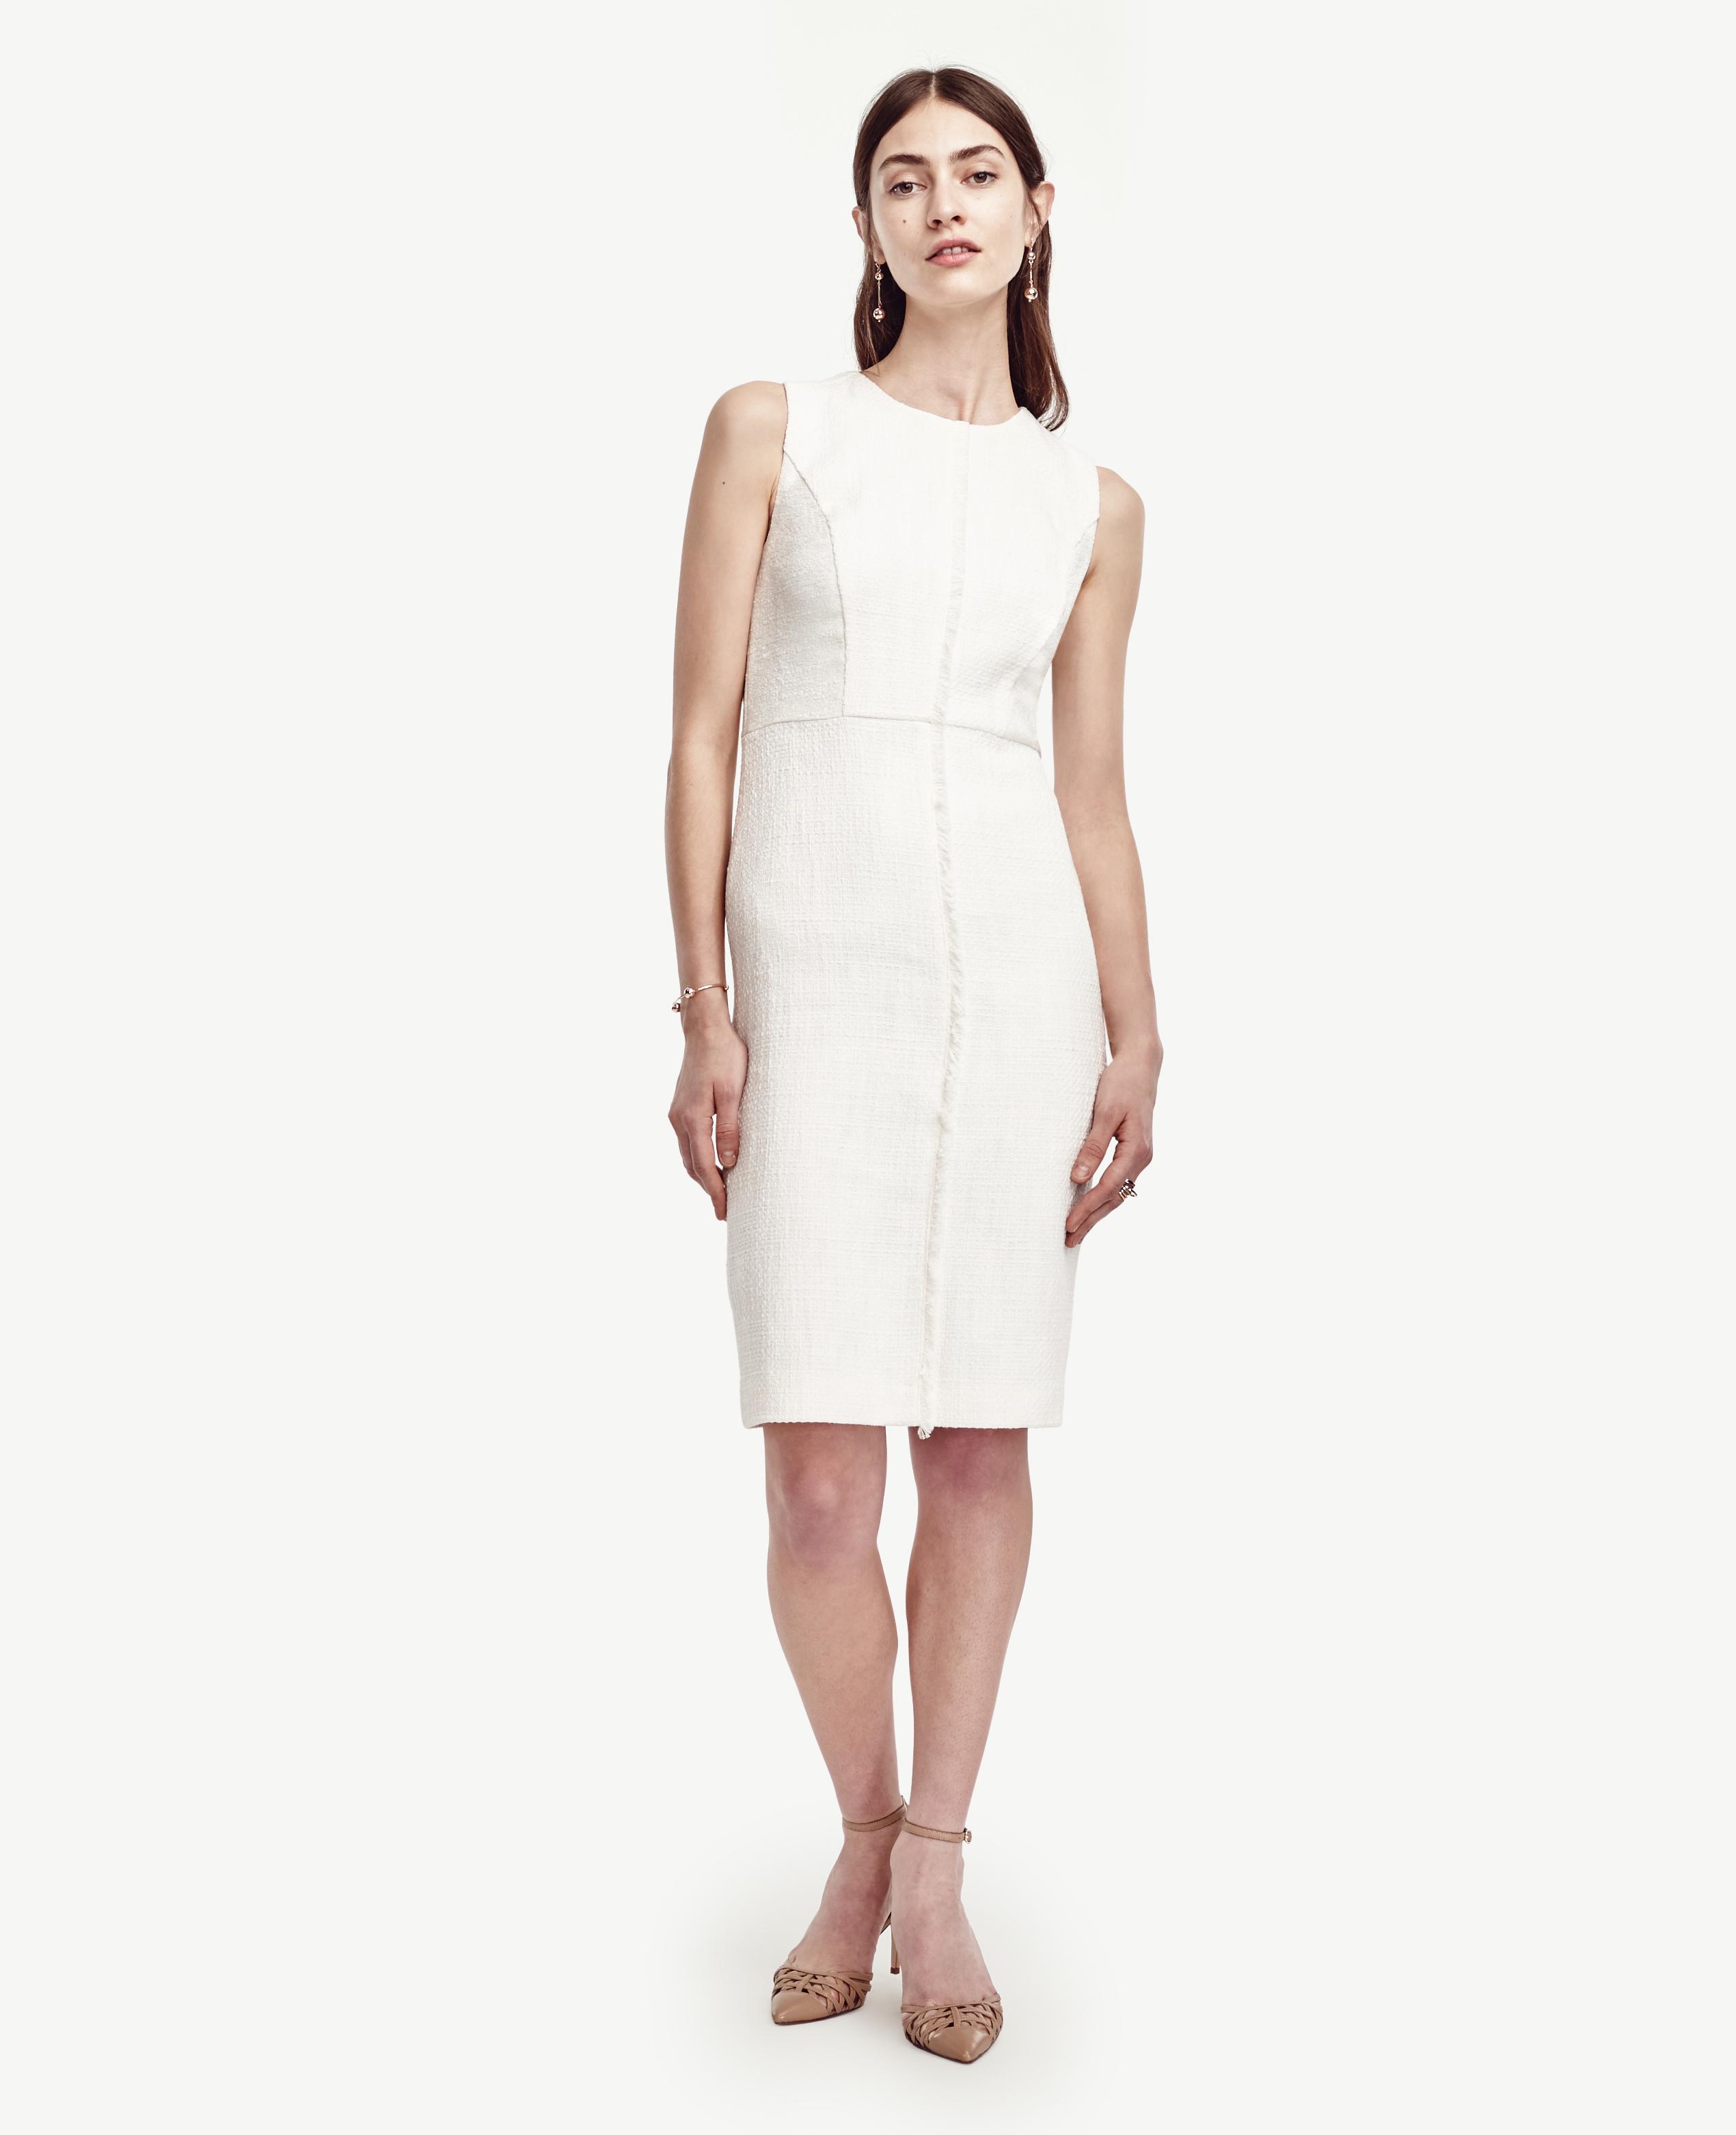 a41006293f0 Lyst Ann Taylor Pee Tweed Fringe Sheath Dress In White. Sydne Style Kate  Hudson Ann Taylor White Dress Rose Gold Sandals Platforms